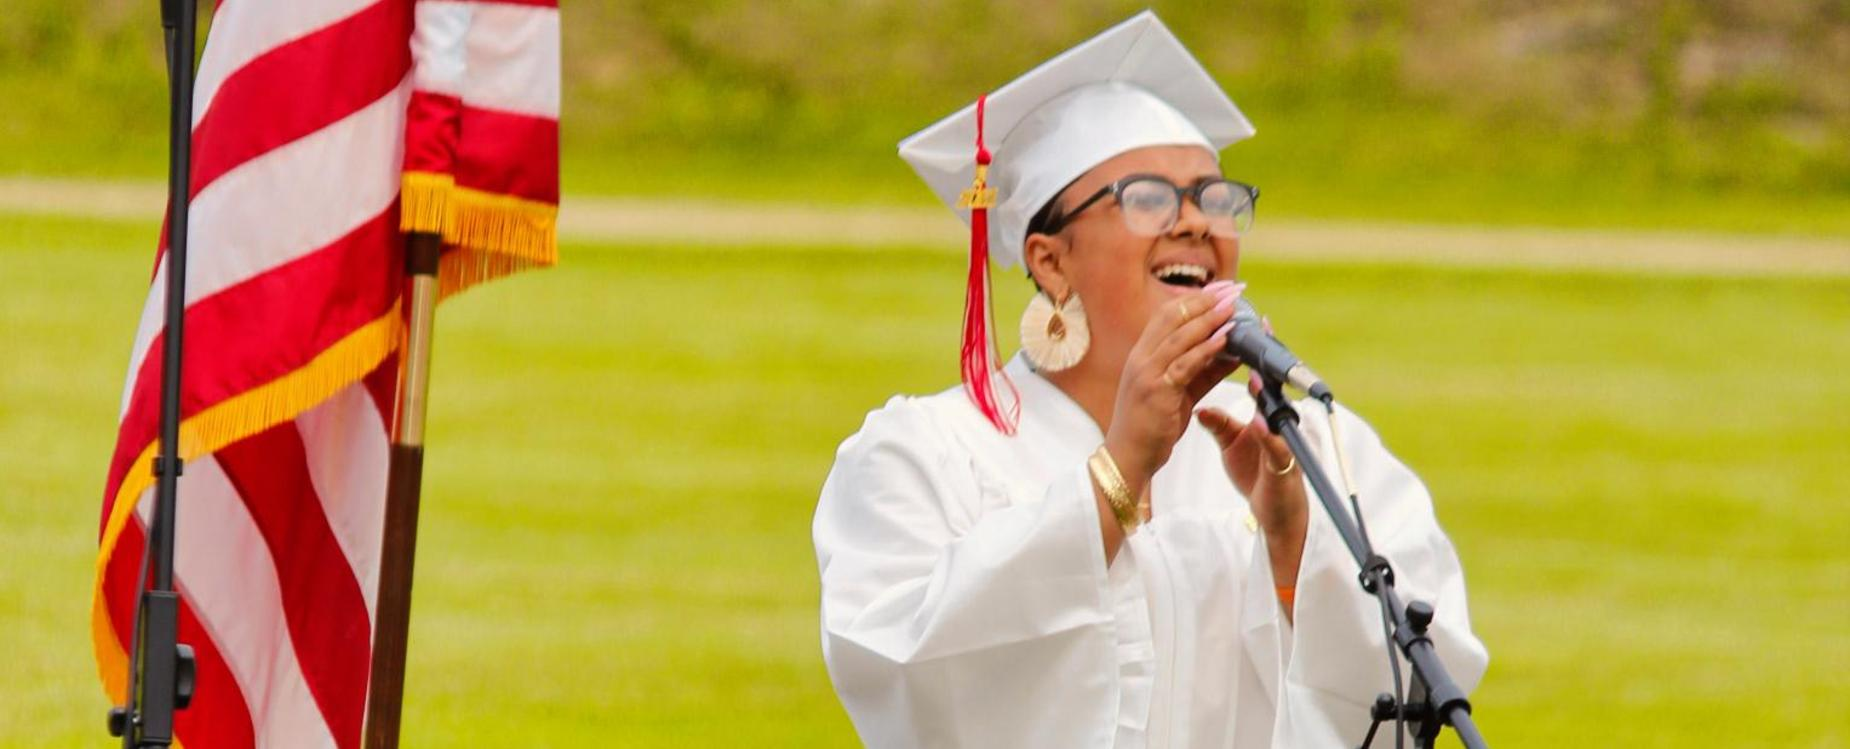 Wandaliz Quiñones Otero sings the national anthem at graduation 2021